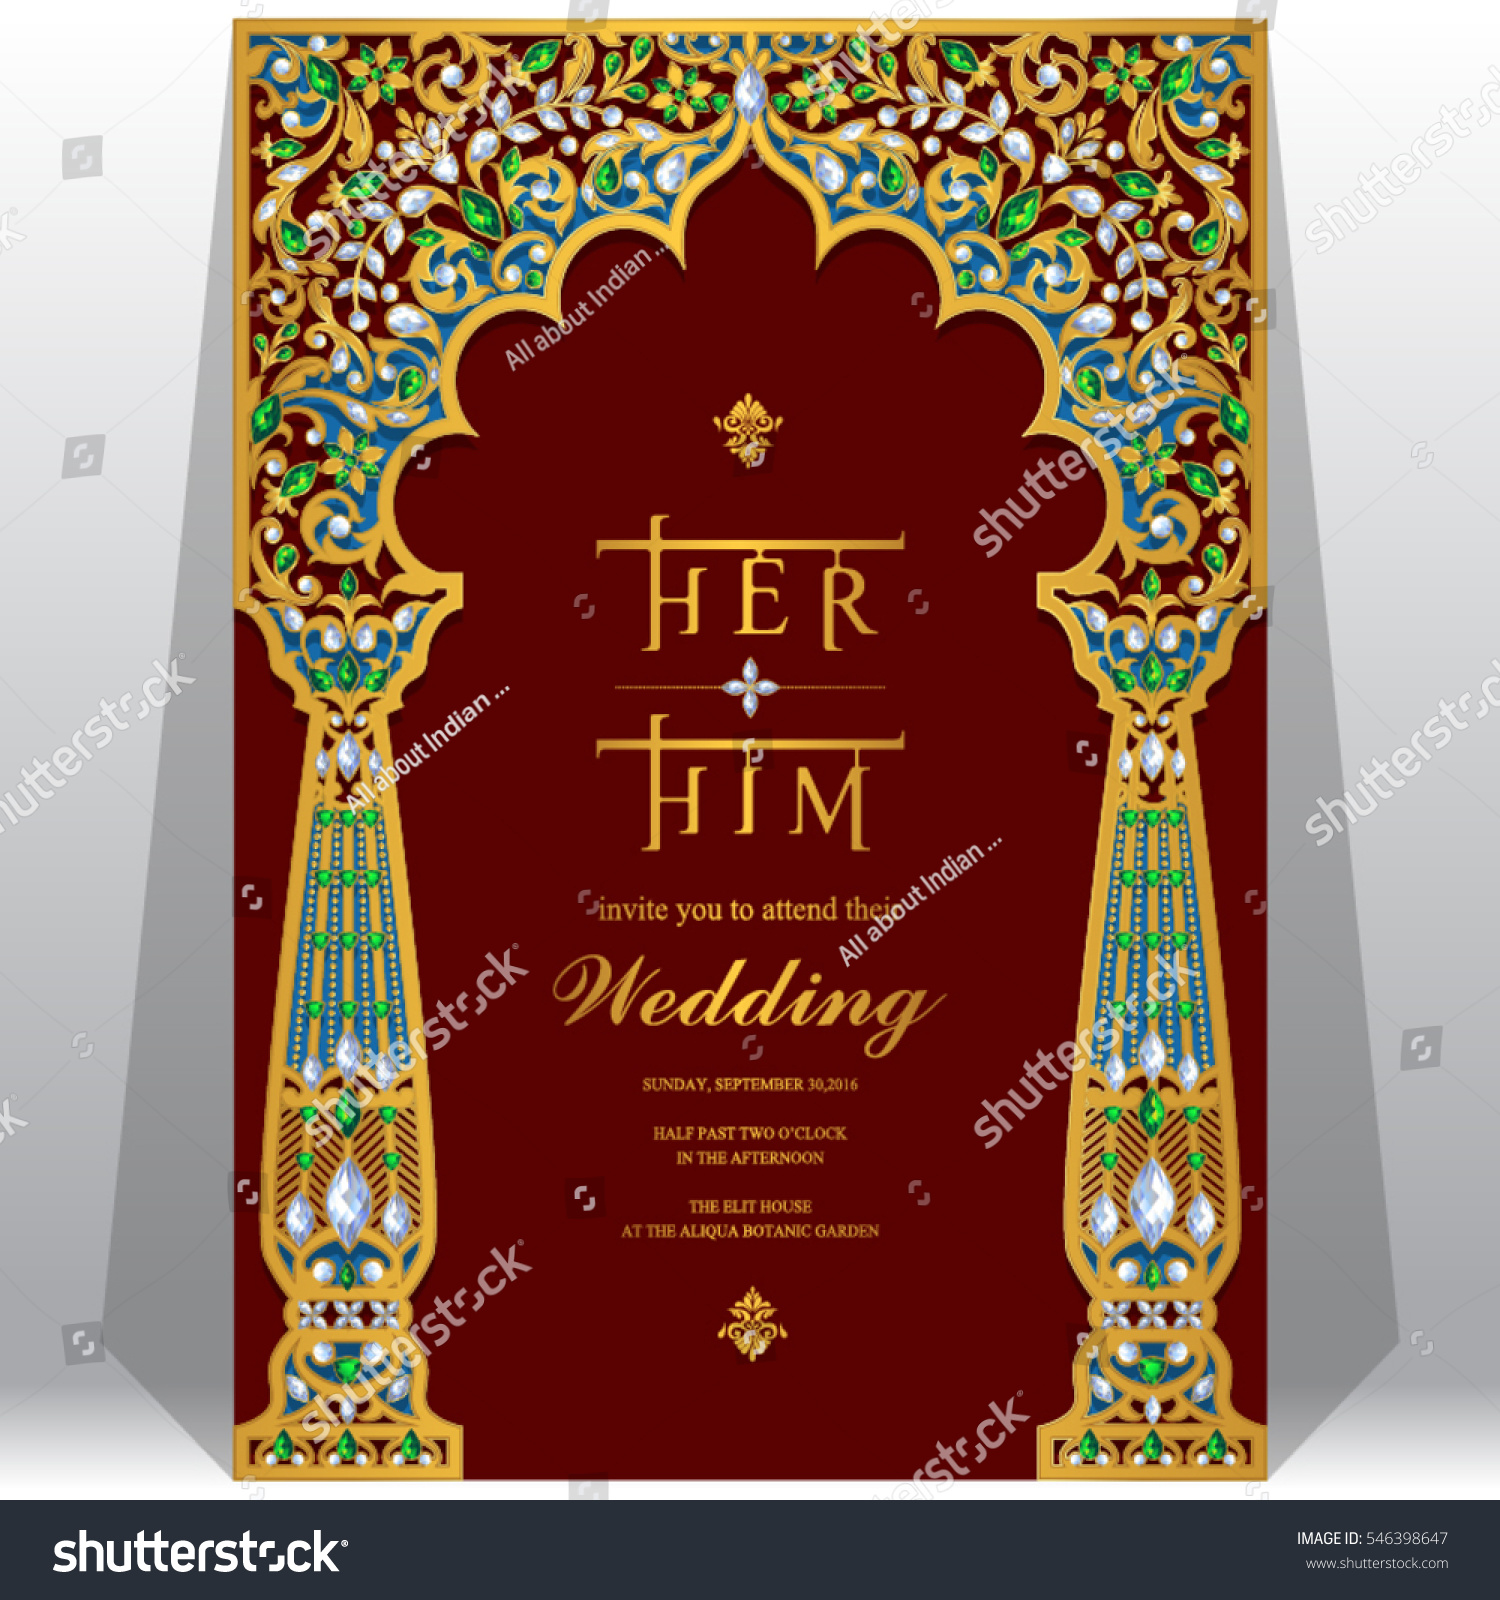 Indian Wedding Invitation Card Templates Gold Stock Vector 546398647 ...